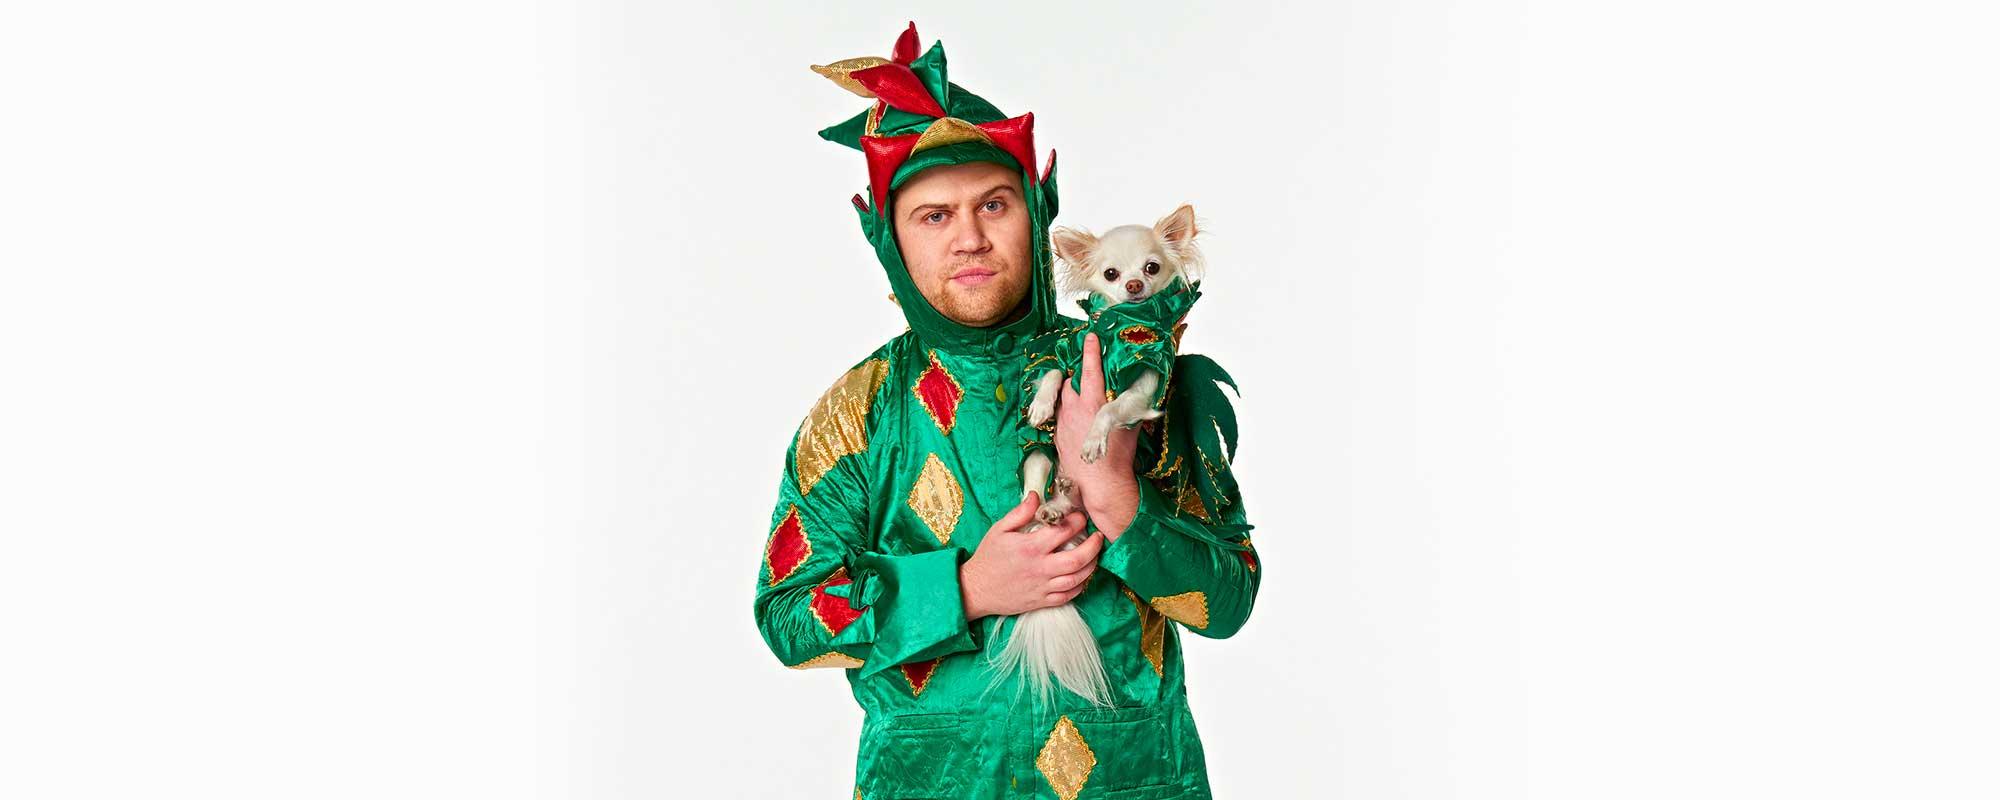 Piff the Magic Dragon show show